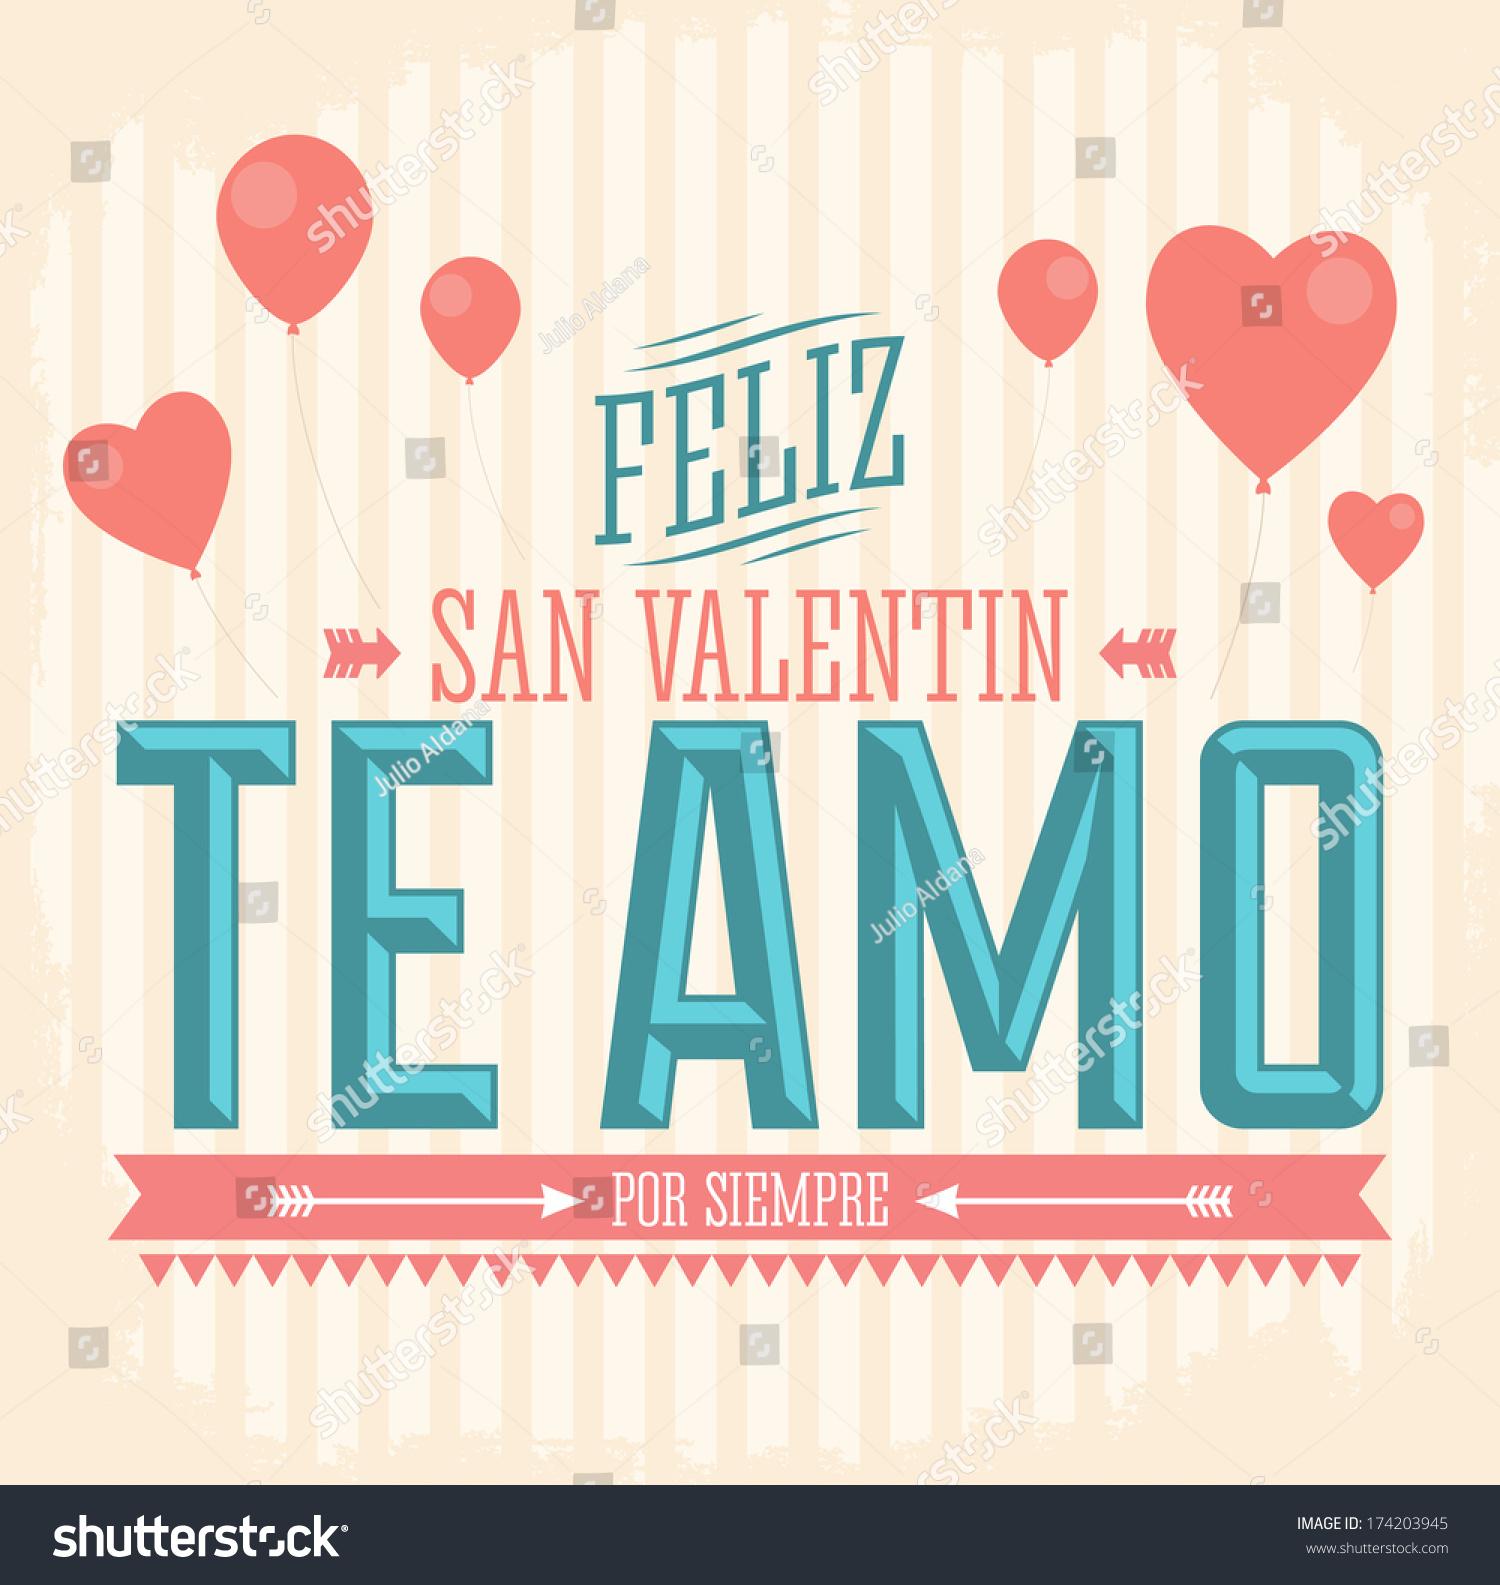 Te Amo Feliz San Valentin   I Love You Happy Valentines Day Spanish Text    Vector